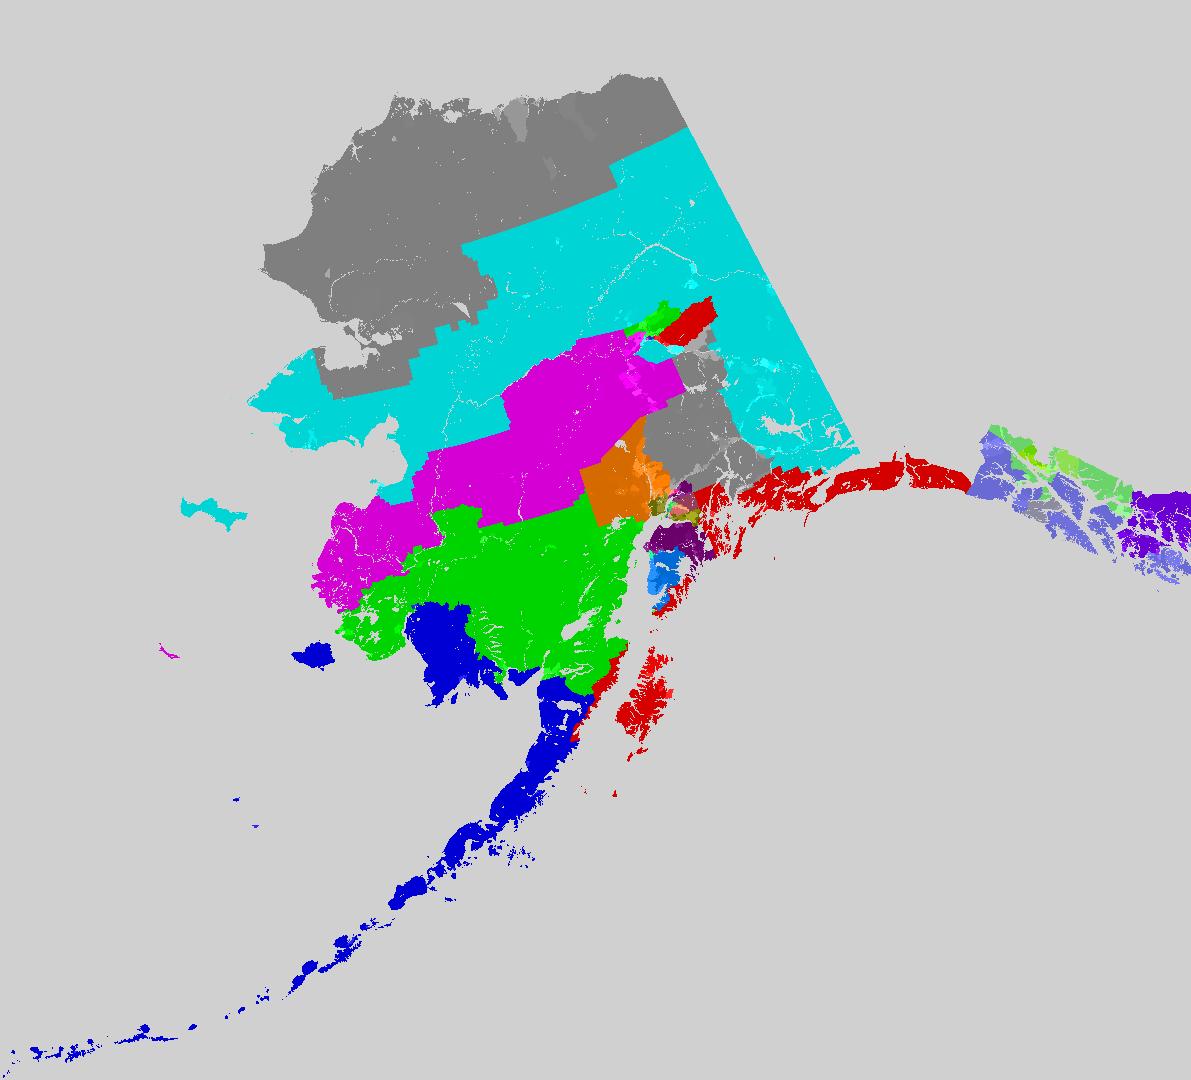 Alaska House of Representatives Redistricting